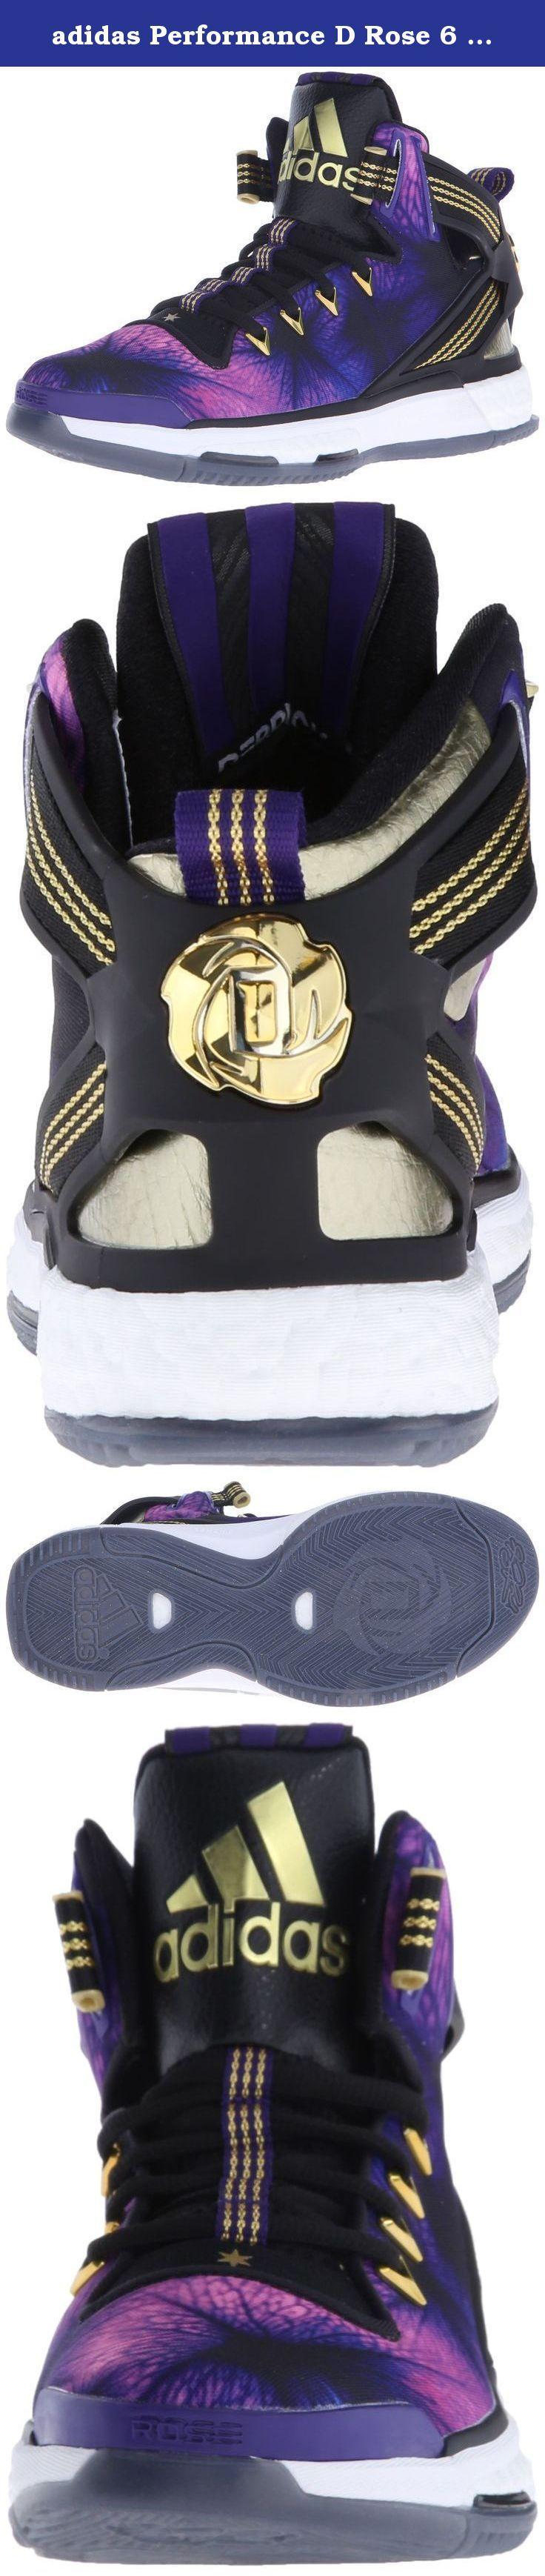 adidas Performance D Rose 6 Boost J Shoe (Big Kid),Black/Purple/Gold,5 M US Big Kid. Kid's Athletic Shoes.